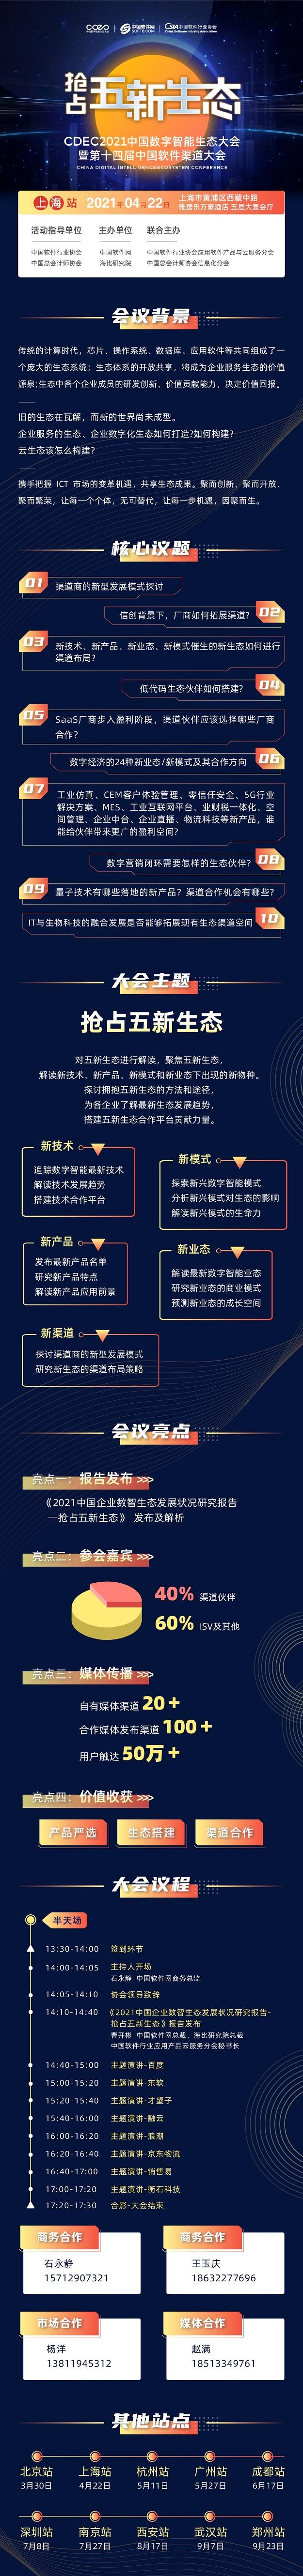 CDEC2021中国软件渠道大会-上海站